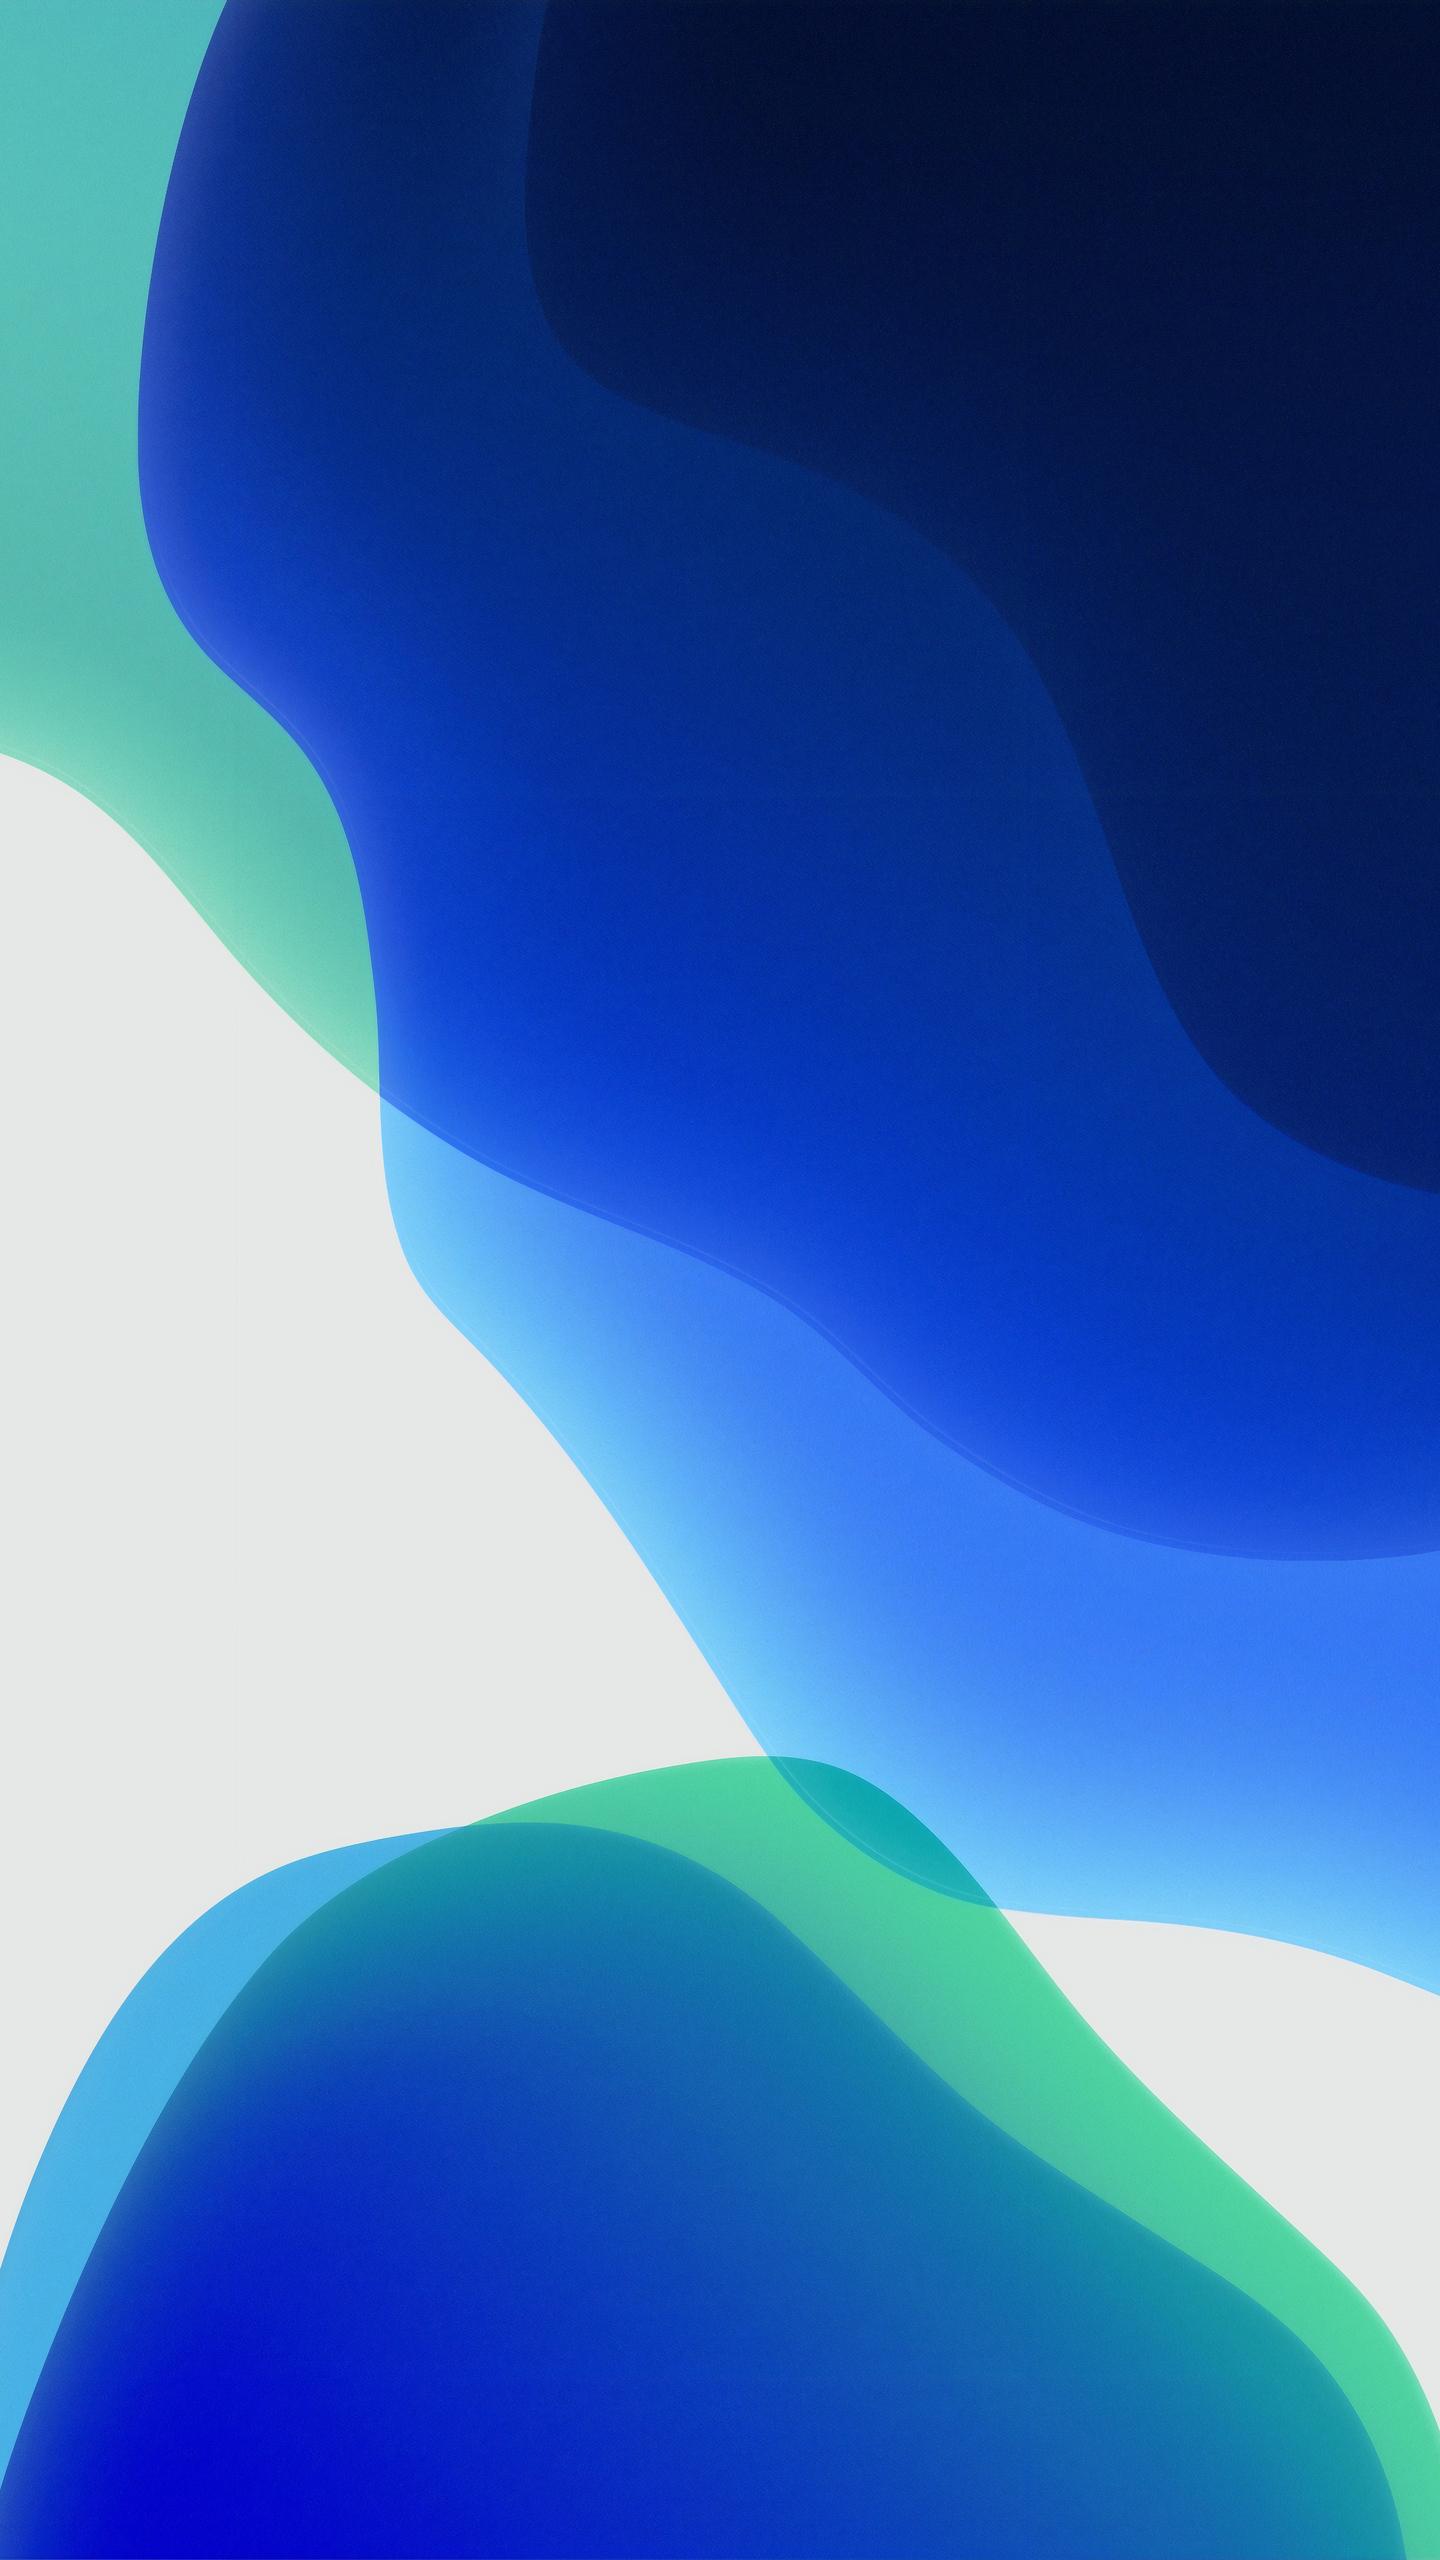 ios-13-blue-white-5k-fp.jpg